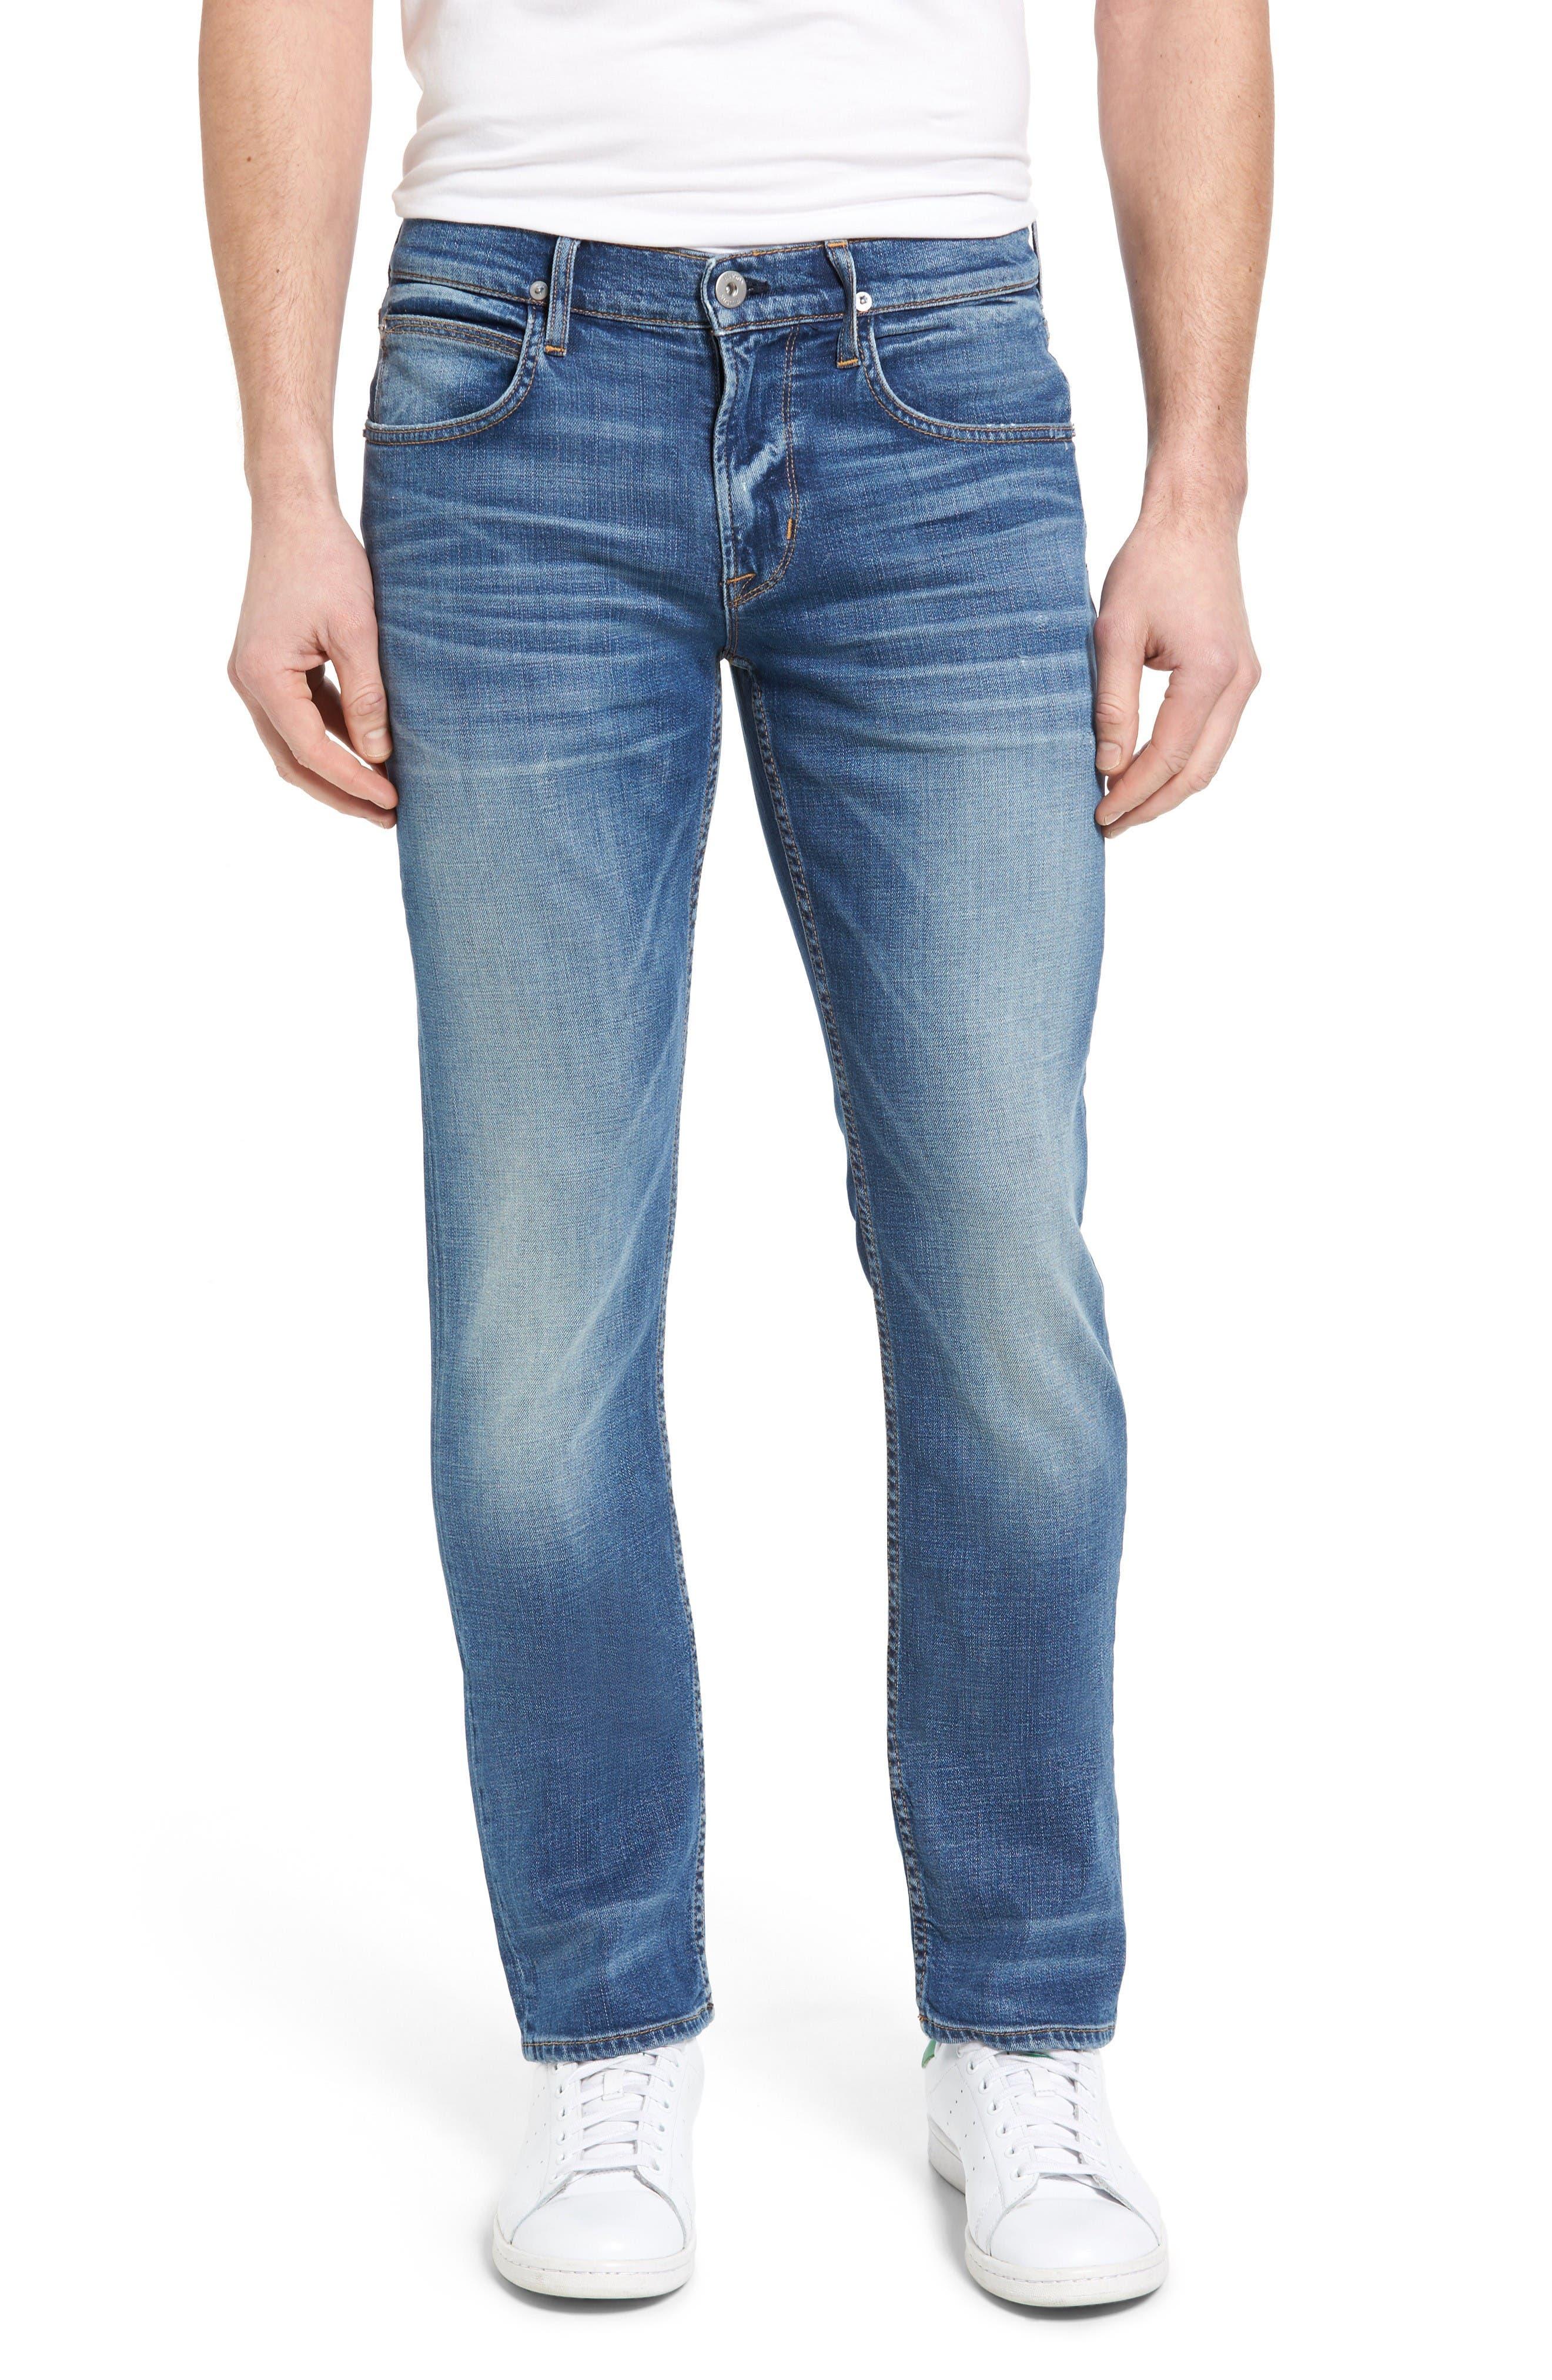 Byron Slim Straight Leg Jeans,                         Main,                         color, Normandy